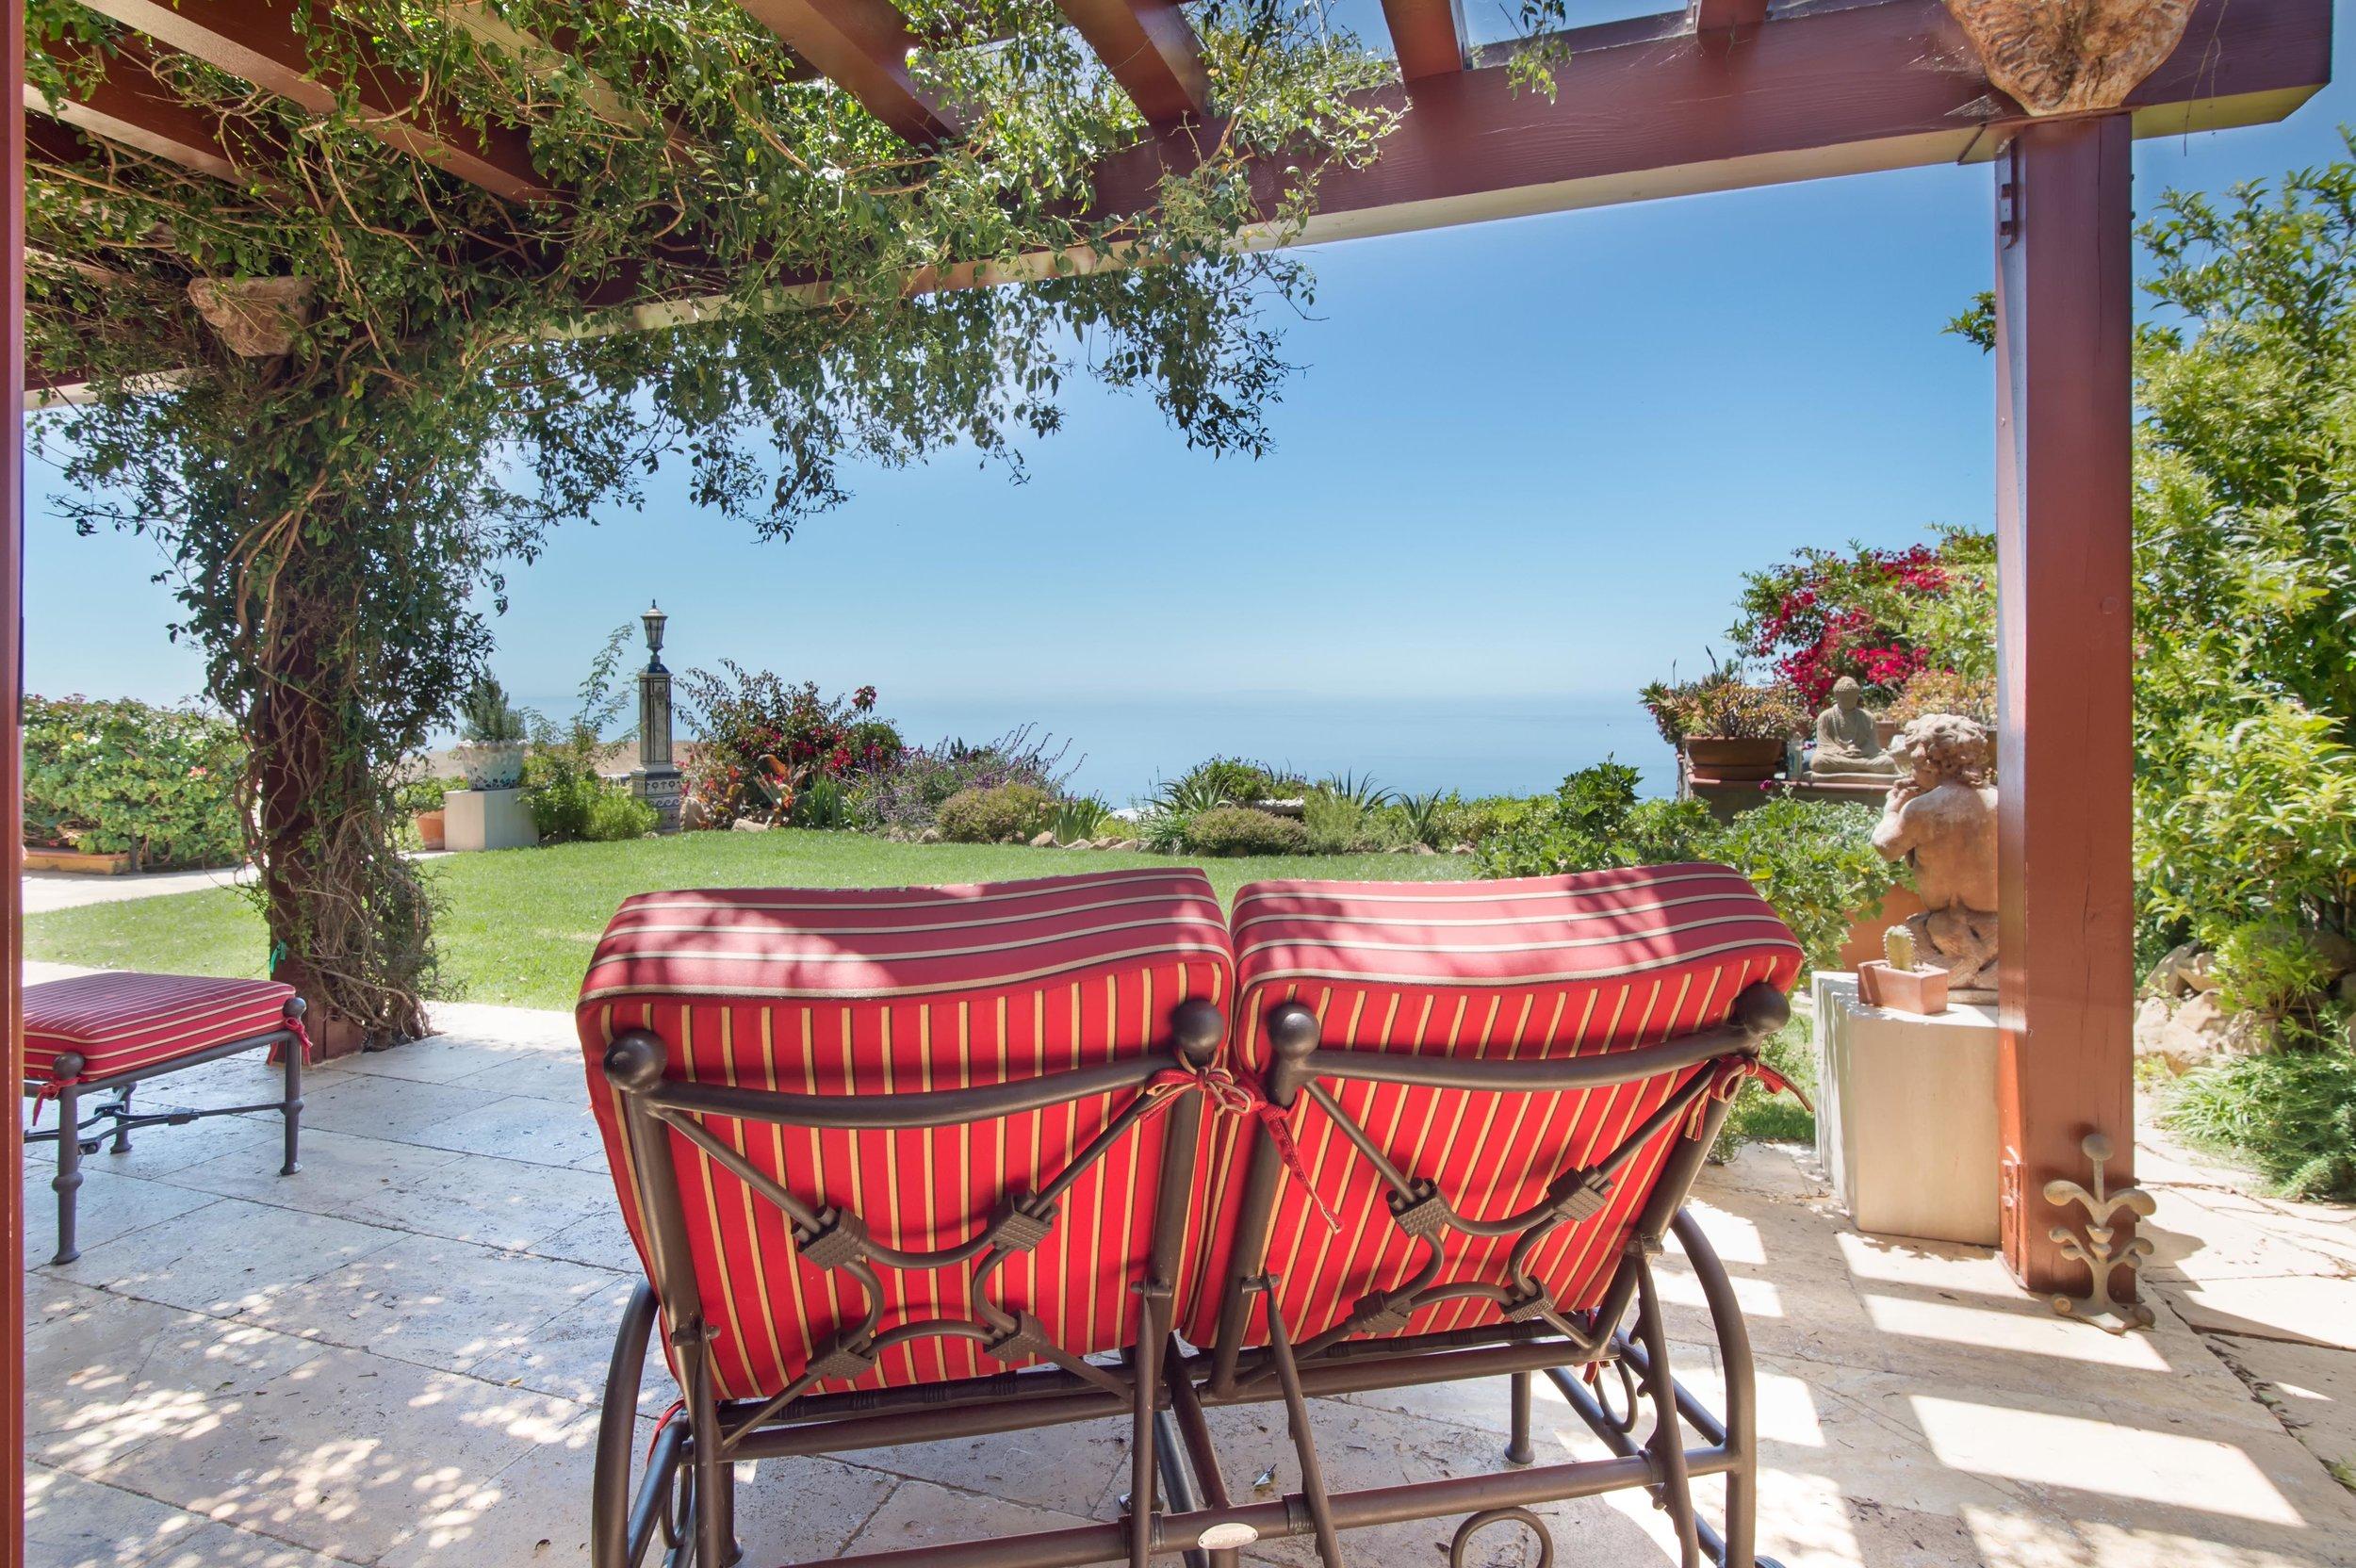 035 Ocean View 26303 Lockwood Road Malibu For Sale Lease The Malibu Life Team Luxury Real Estate.jpg